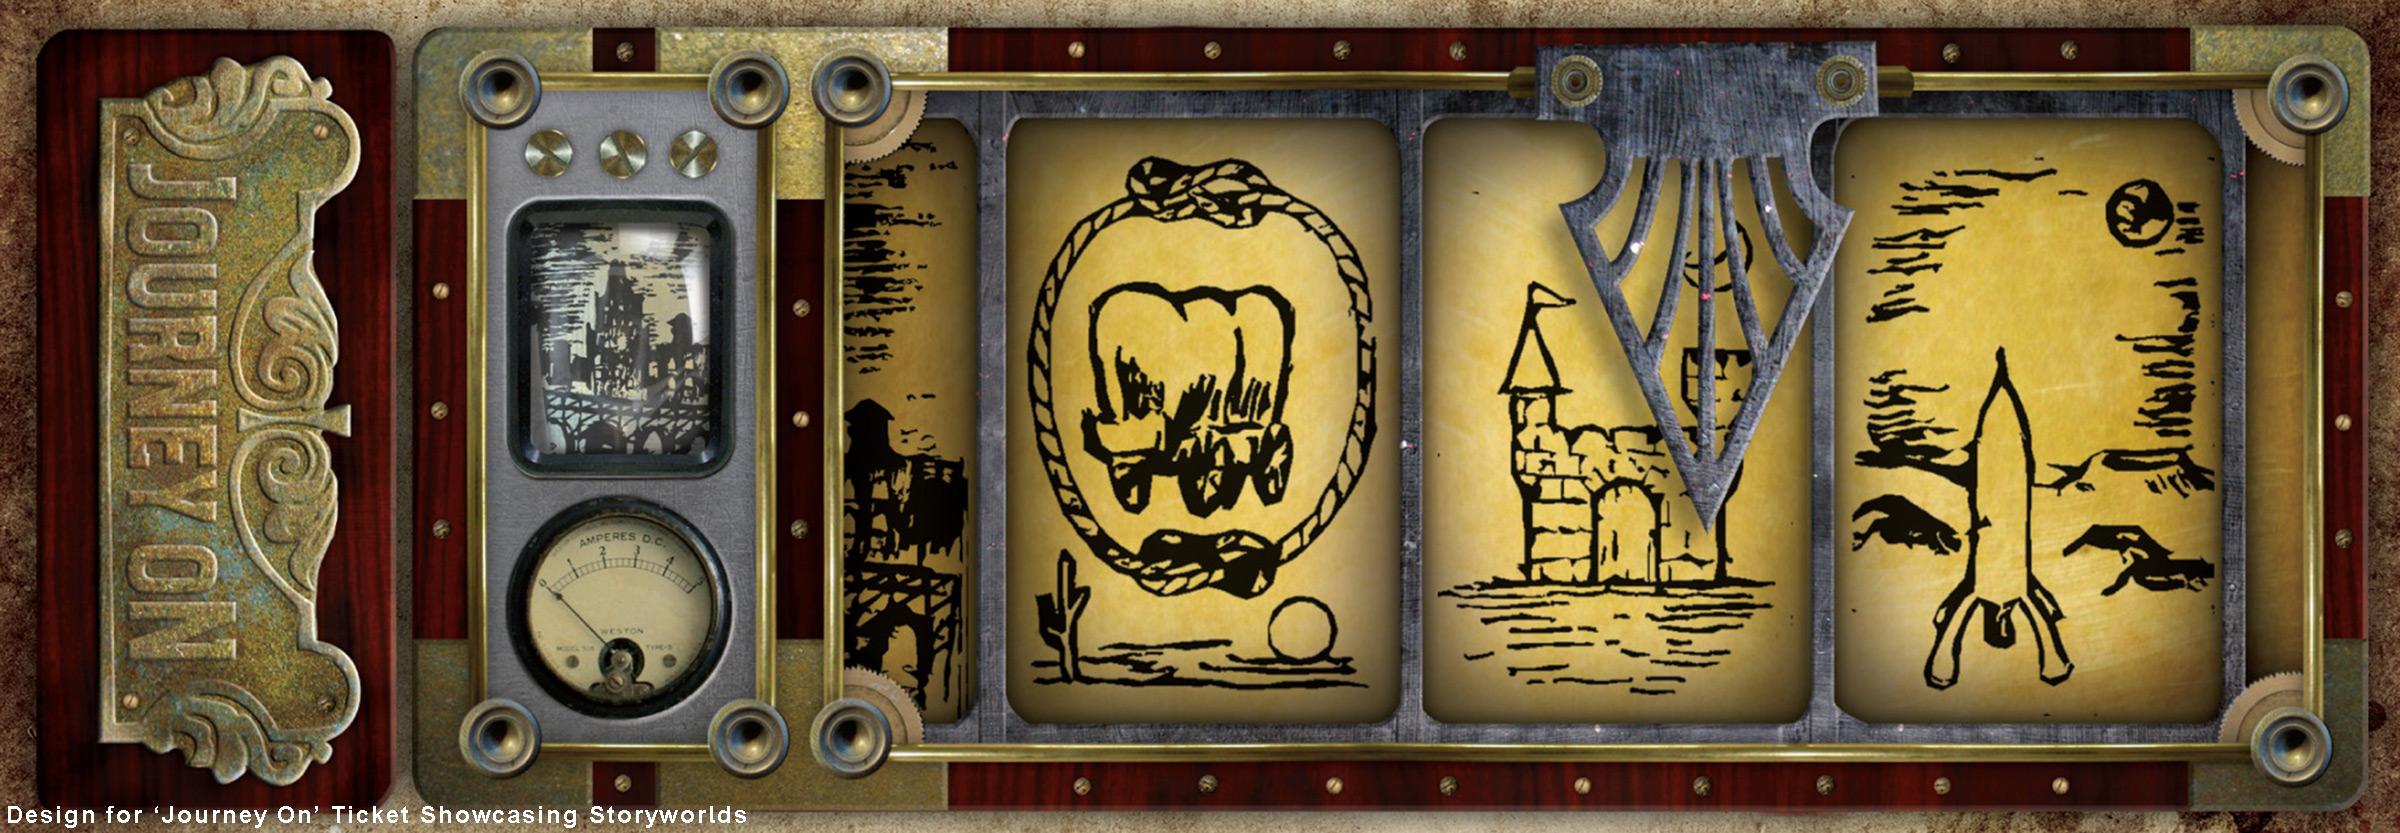 Design for 'Journey On' Ticket Showcasing Storyworlds